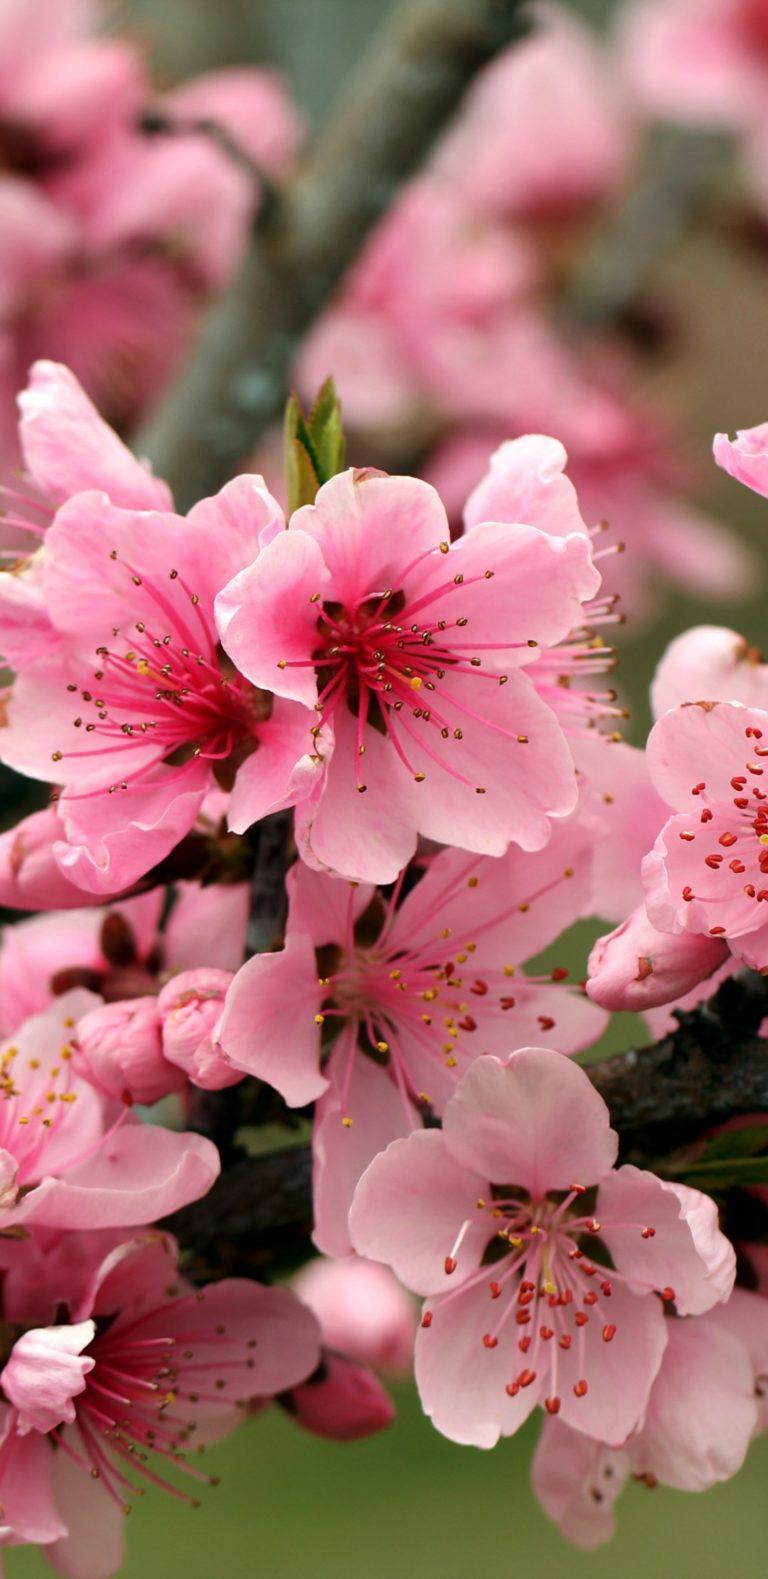 Apple Tree Bright Spring Pink Flowers 1080x2220 768x1579